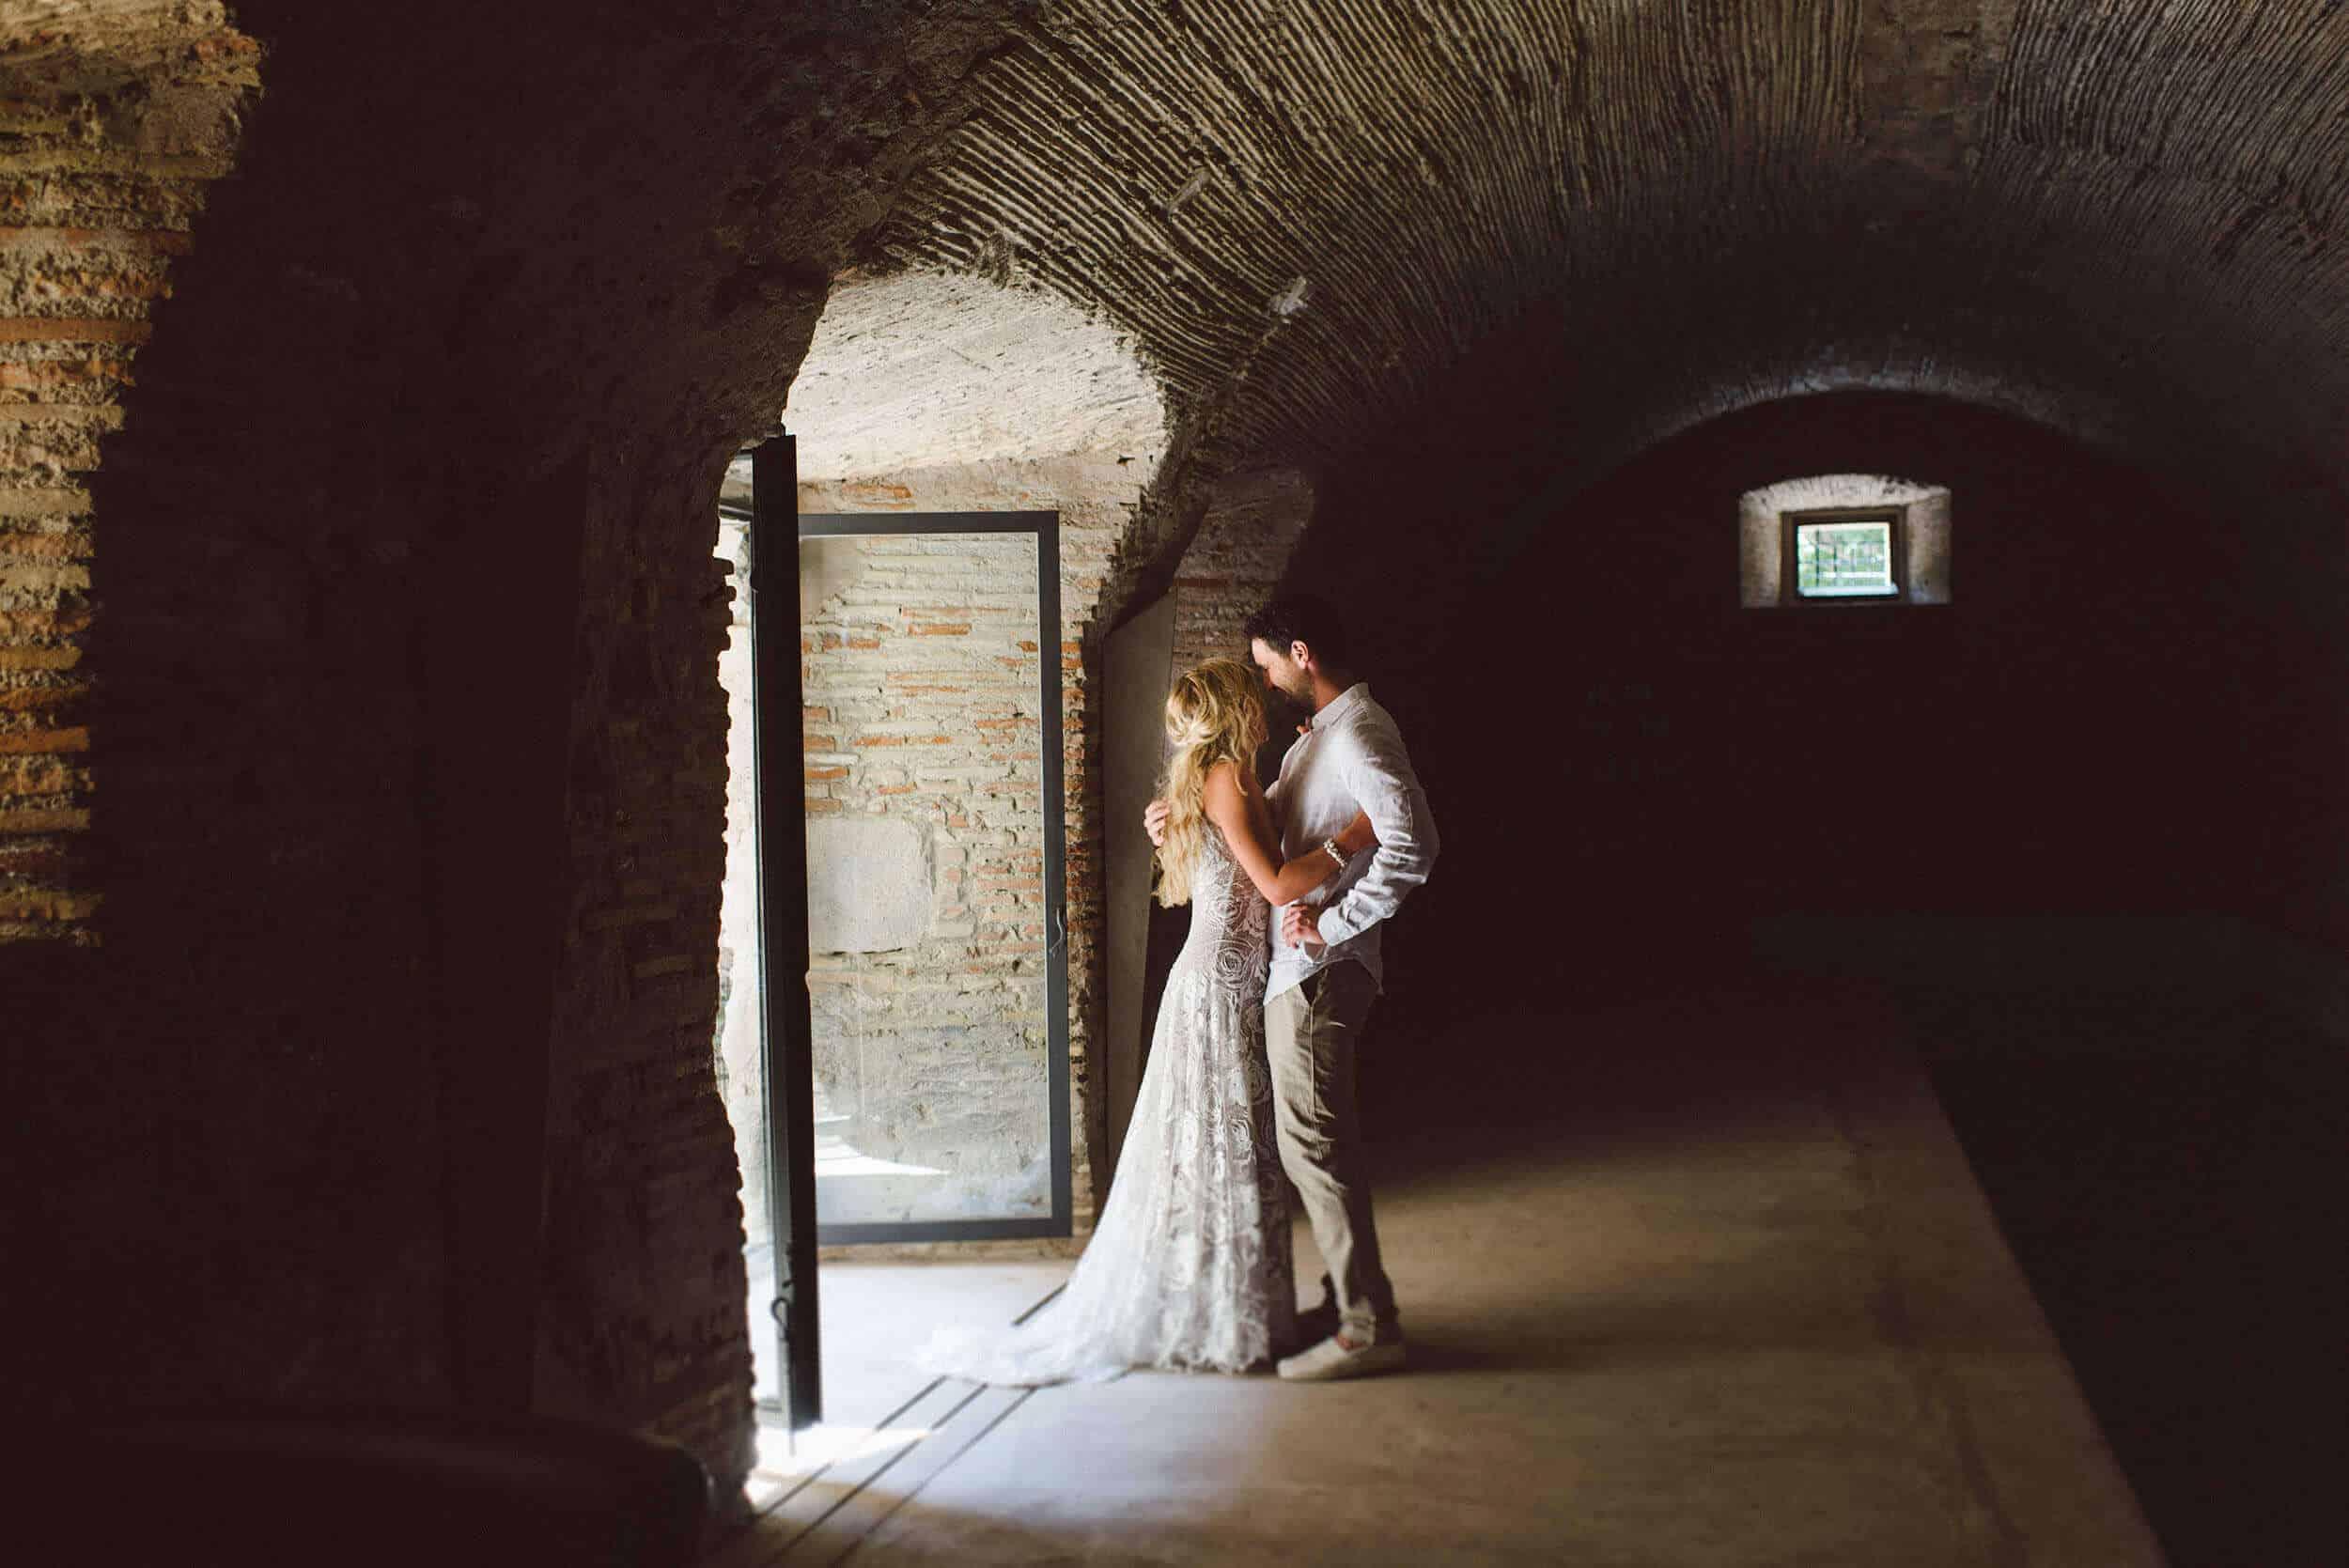 parella Gun pati casaments castell Cortal gran